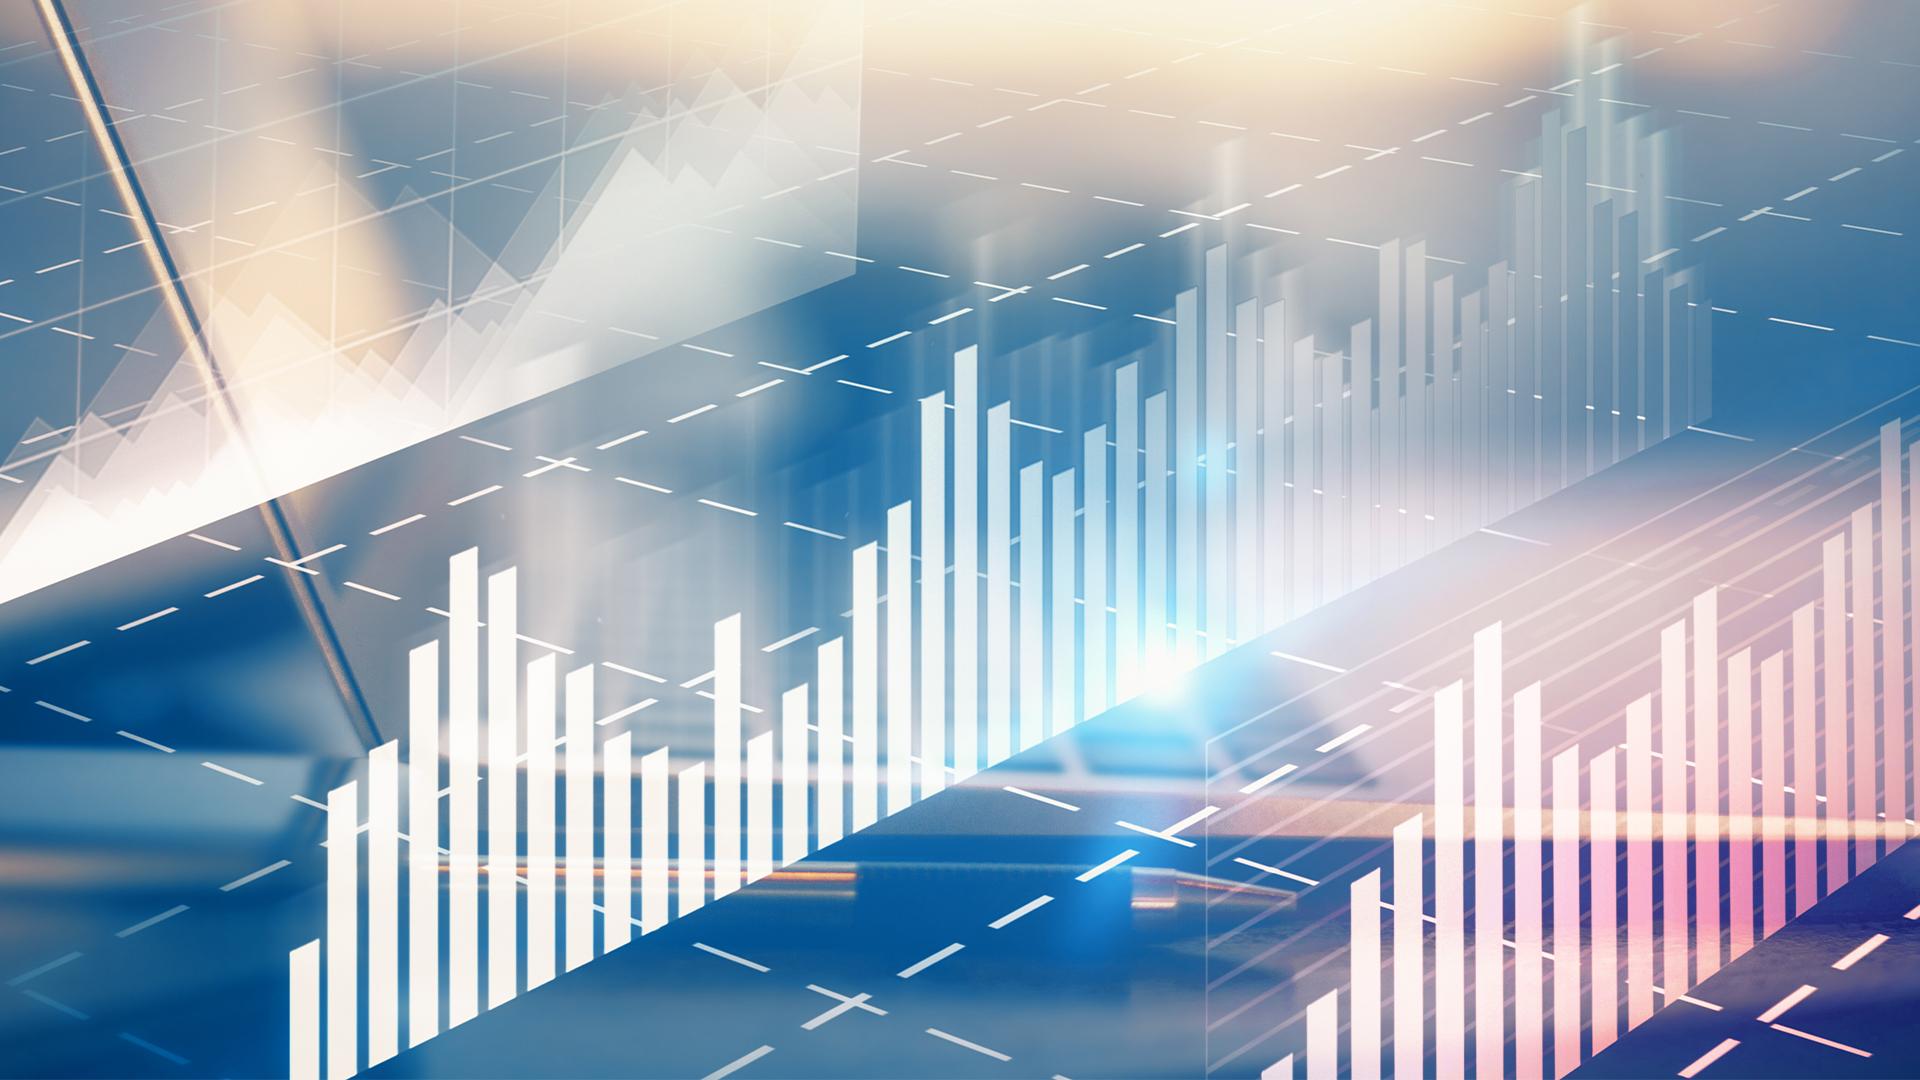 Finance-Banking-Statistics-graph-financial-institution-market-stocks